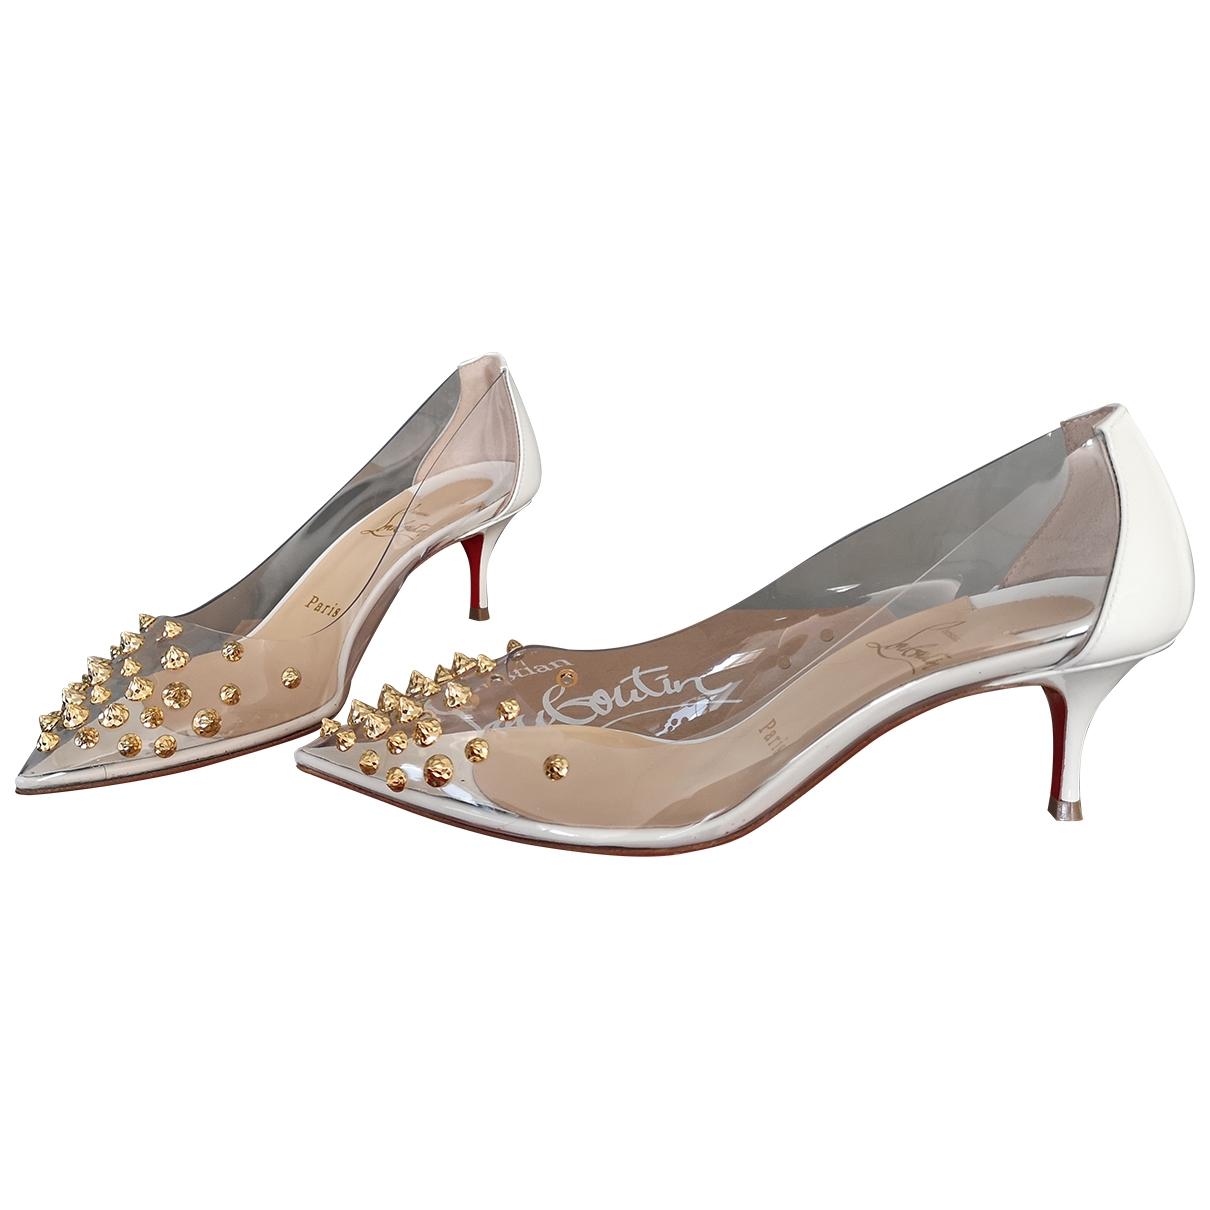 Christian Louboutin Degrastrass White Patent leather Heels for Women 35 EU